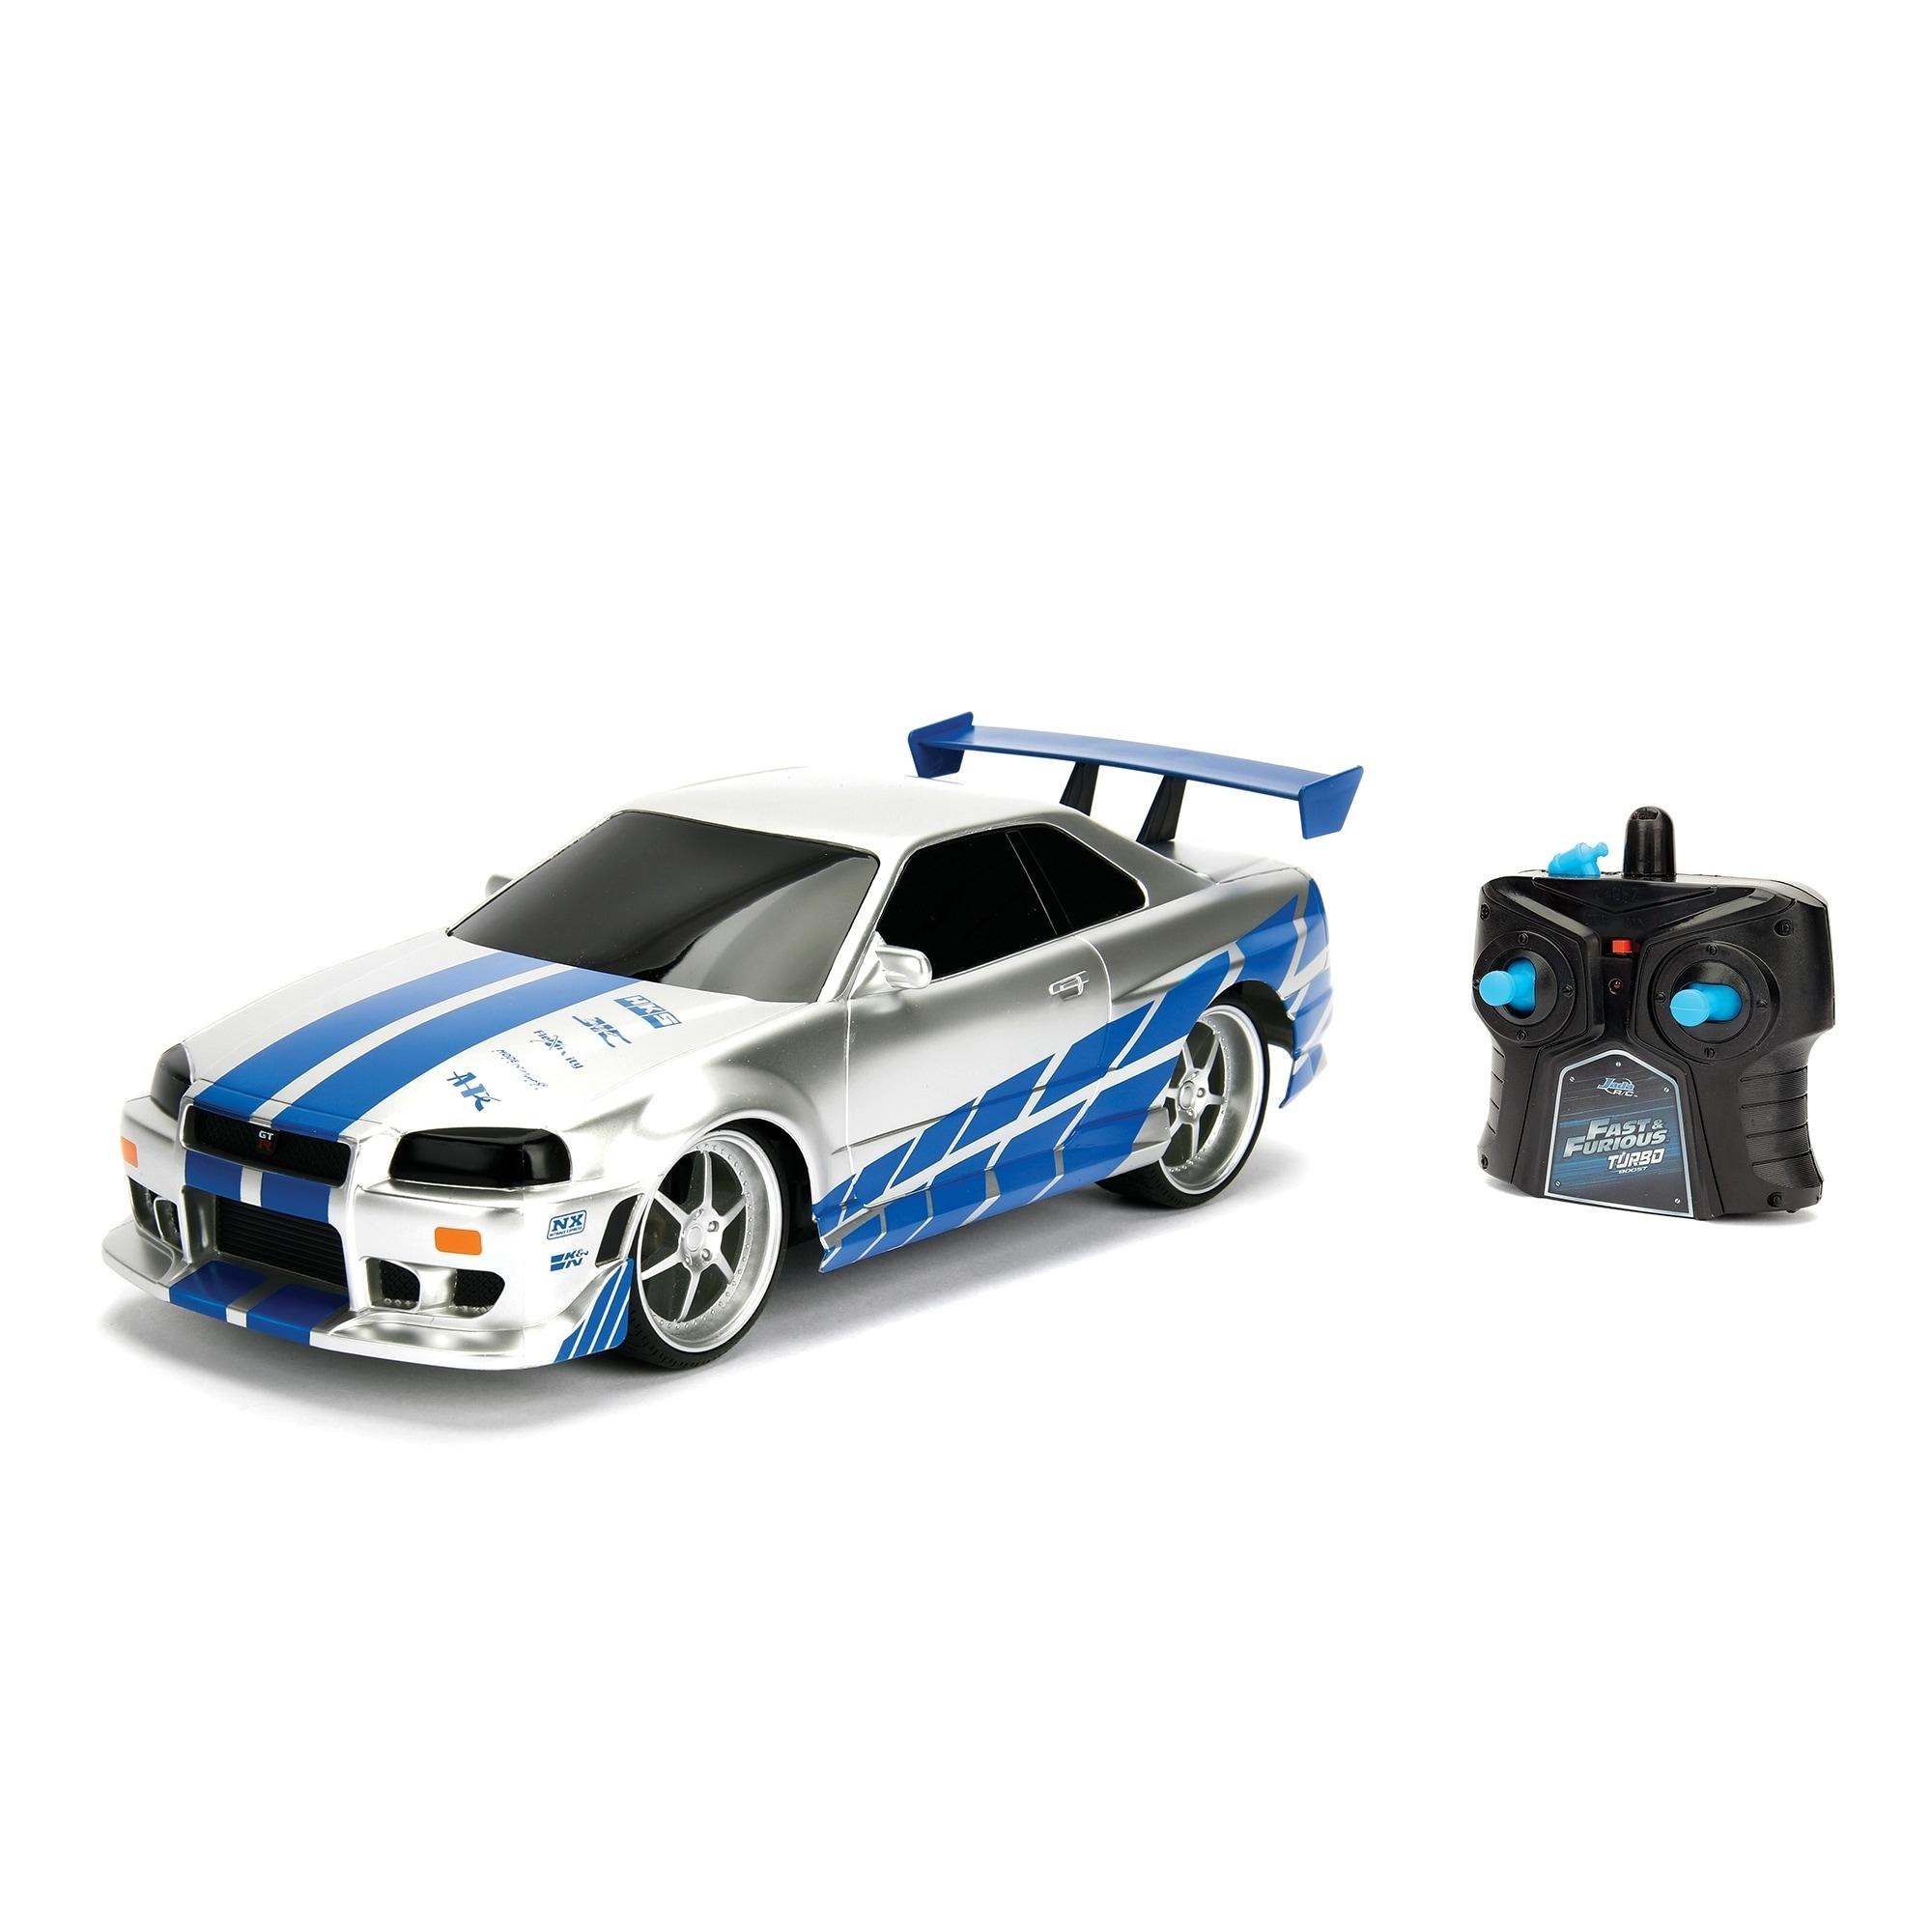 Fast Furious 1 16 Nissan Skyline Gtr R34 Rc Overstock 29477930